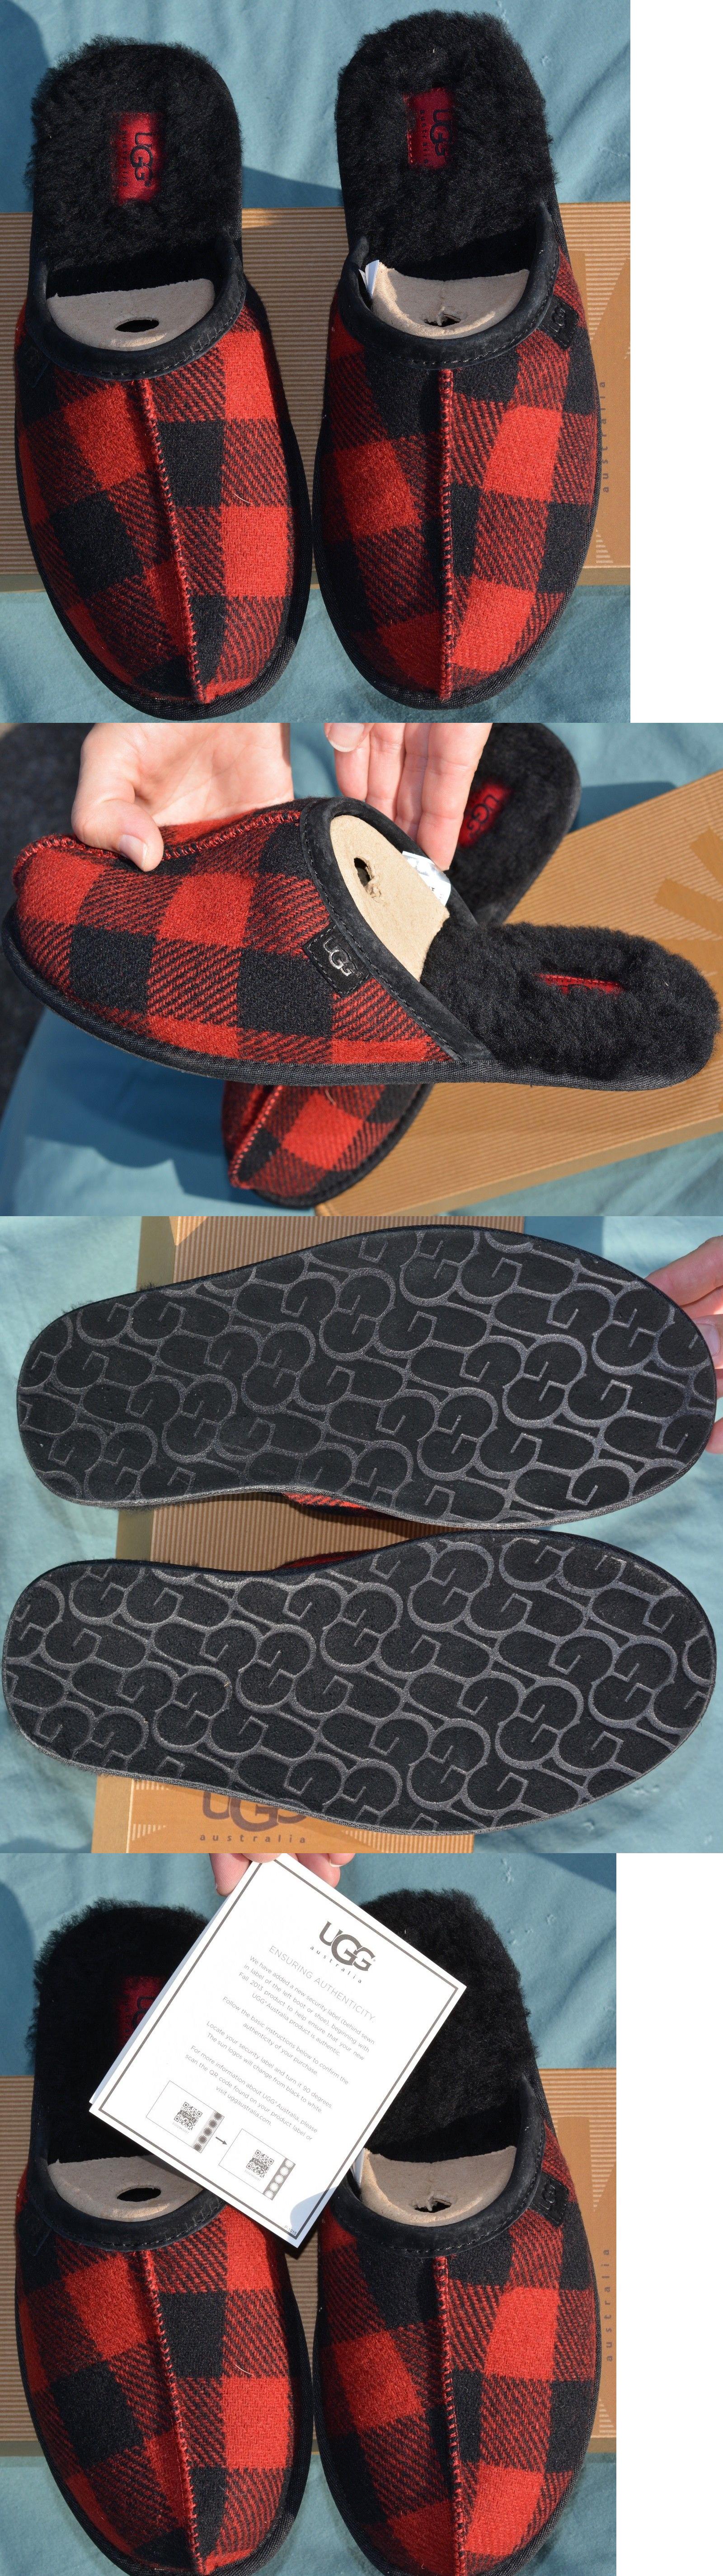 5922f03b121 Slippers 11505: New Ugg Australia Men Size 10 Us 43 Mens Scuff Plaid ...